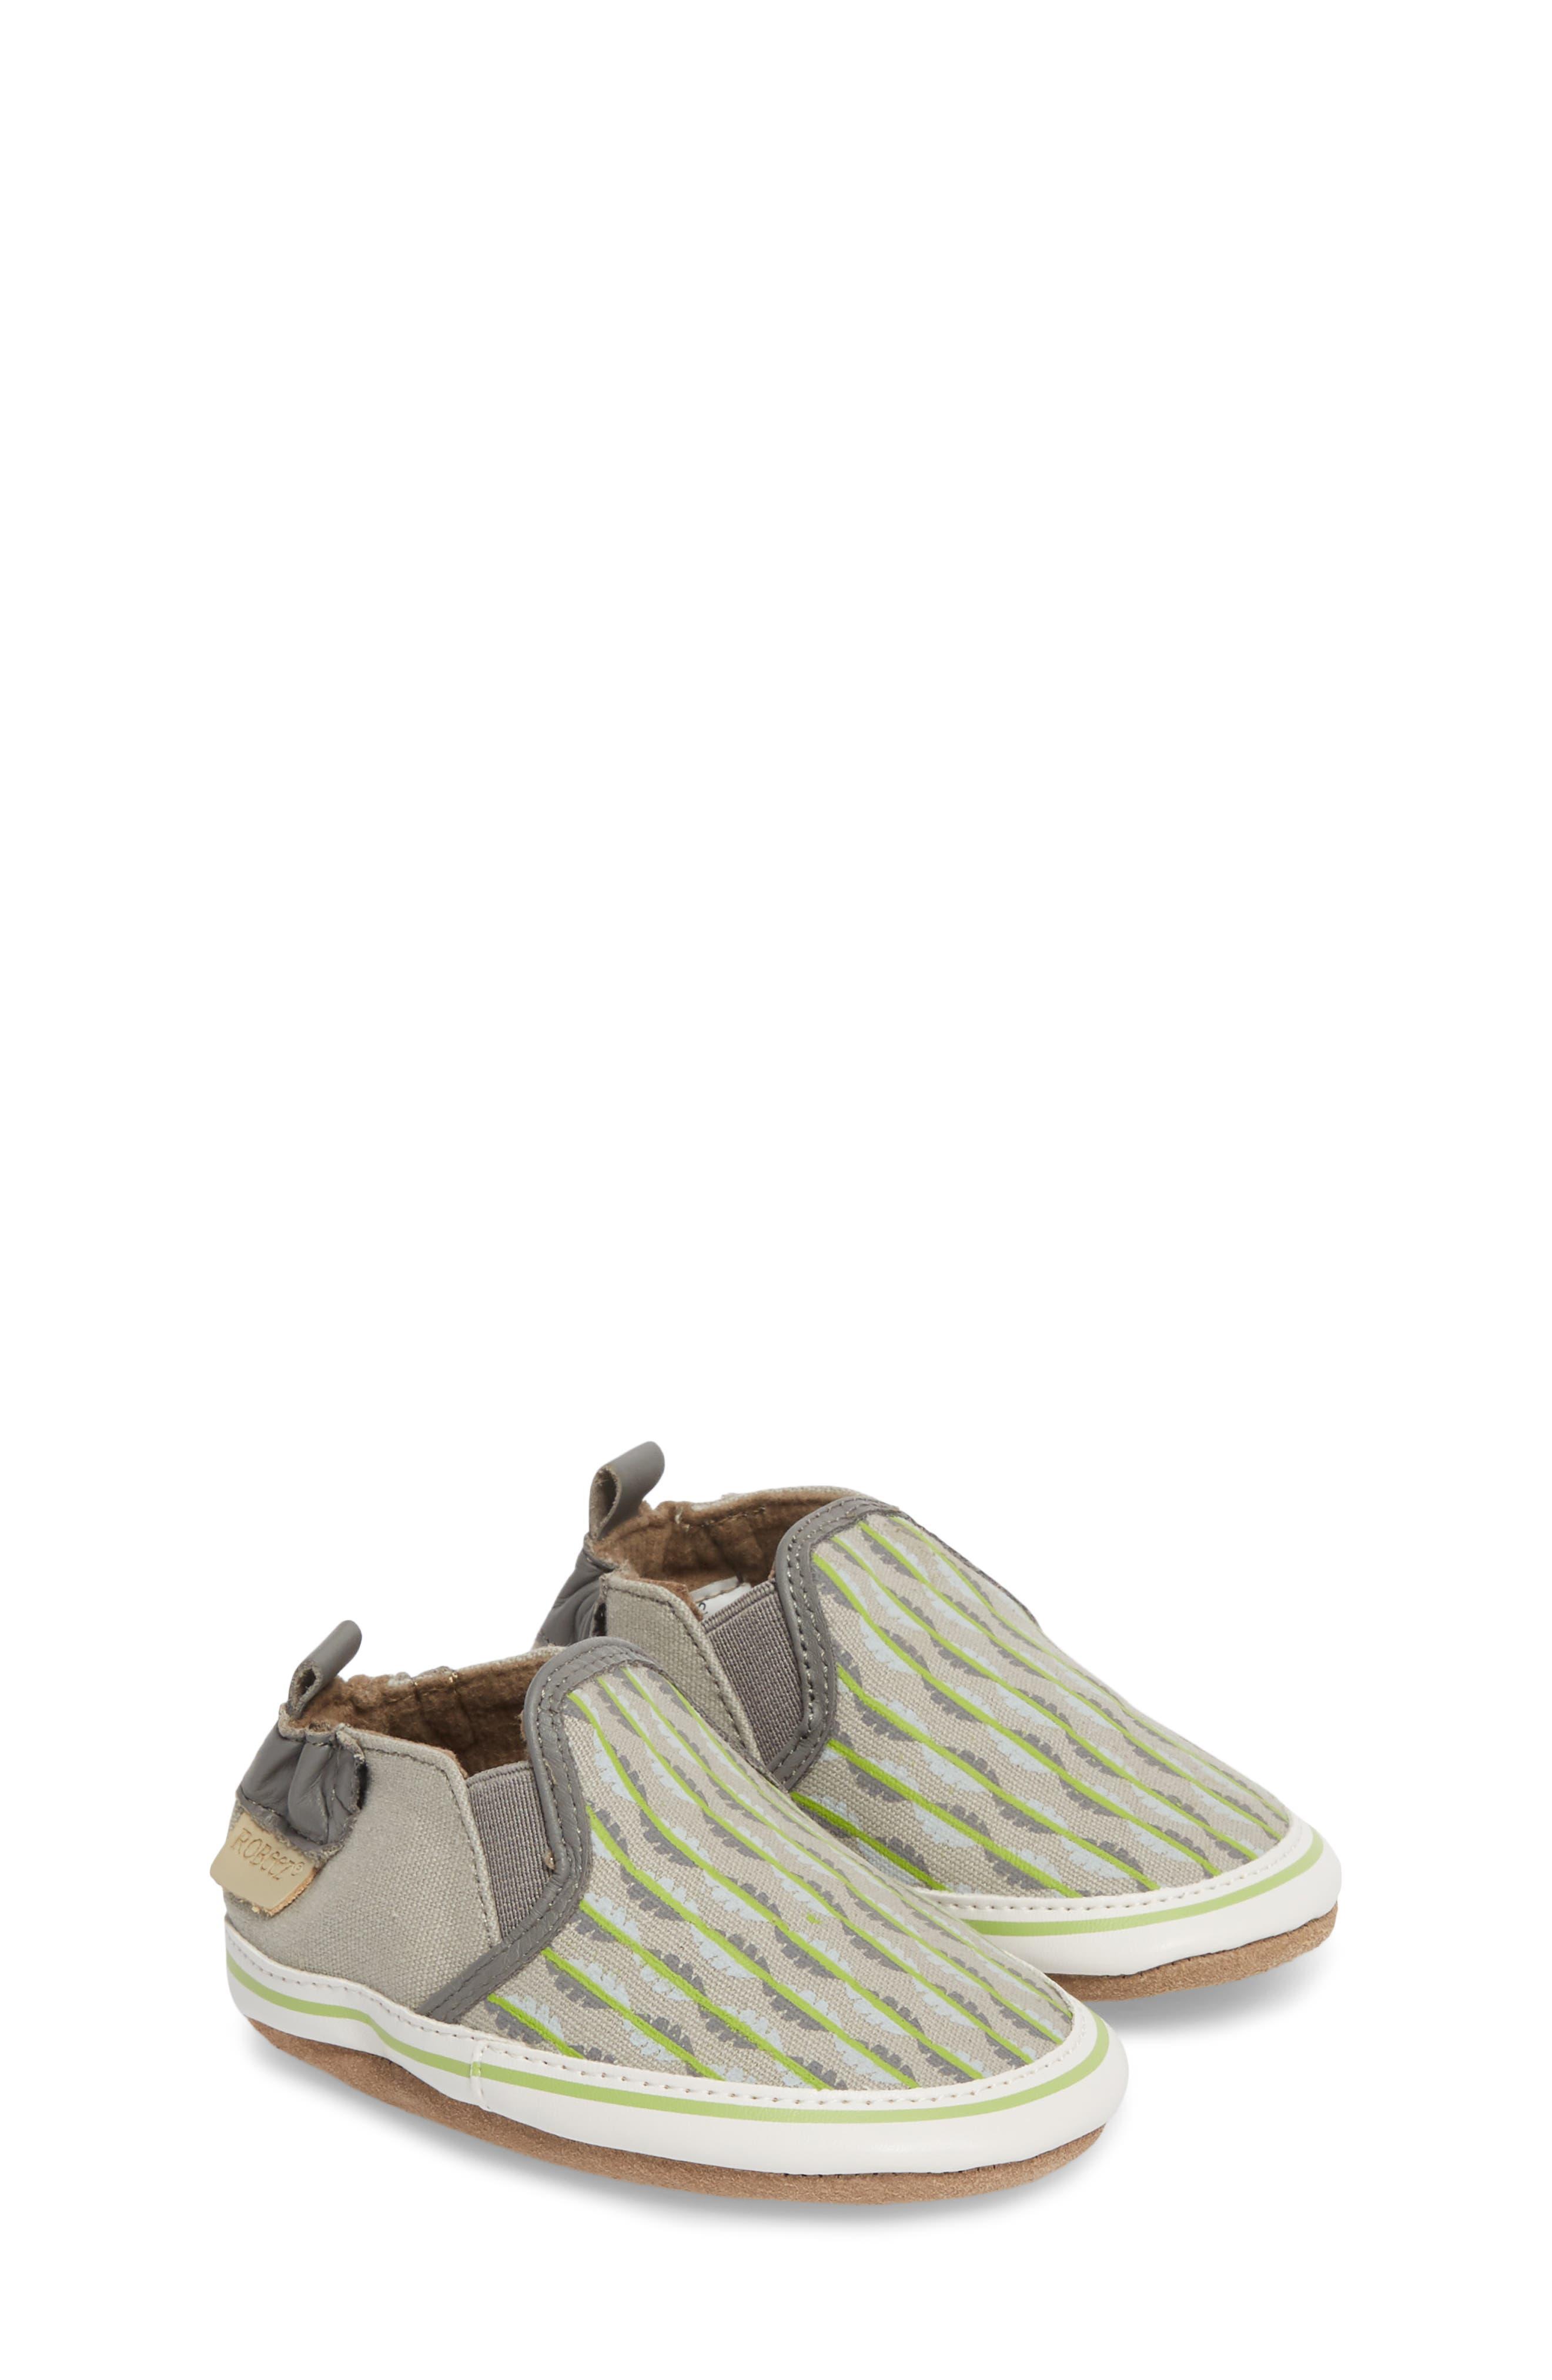 Liam Tropical Print Crib Shoe,                             Alternate thumbnail 3, color,                             Grey